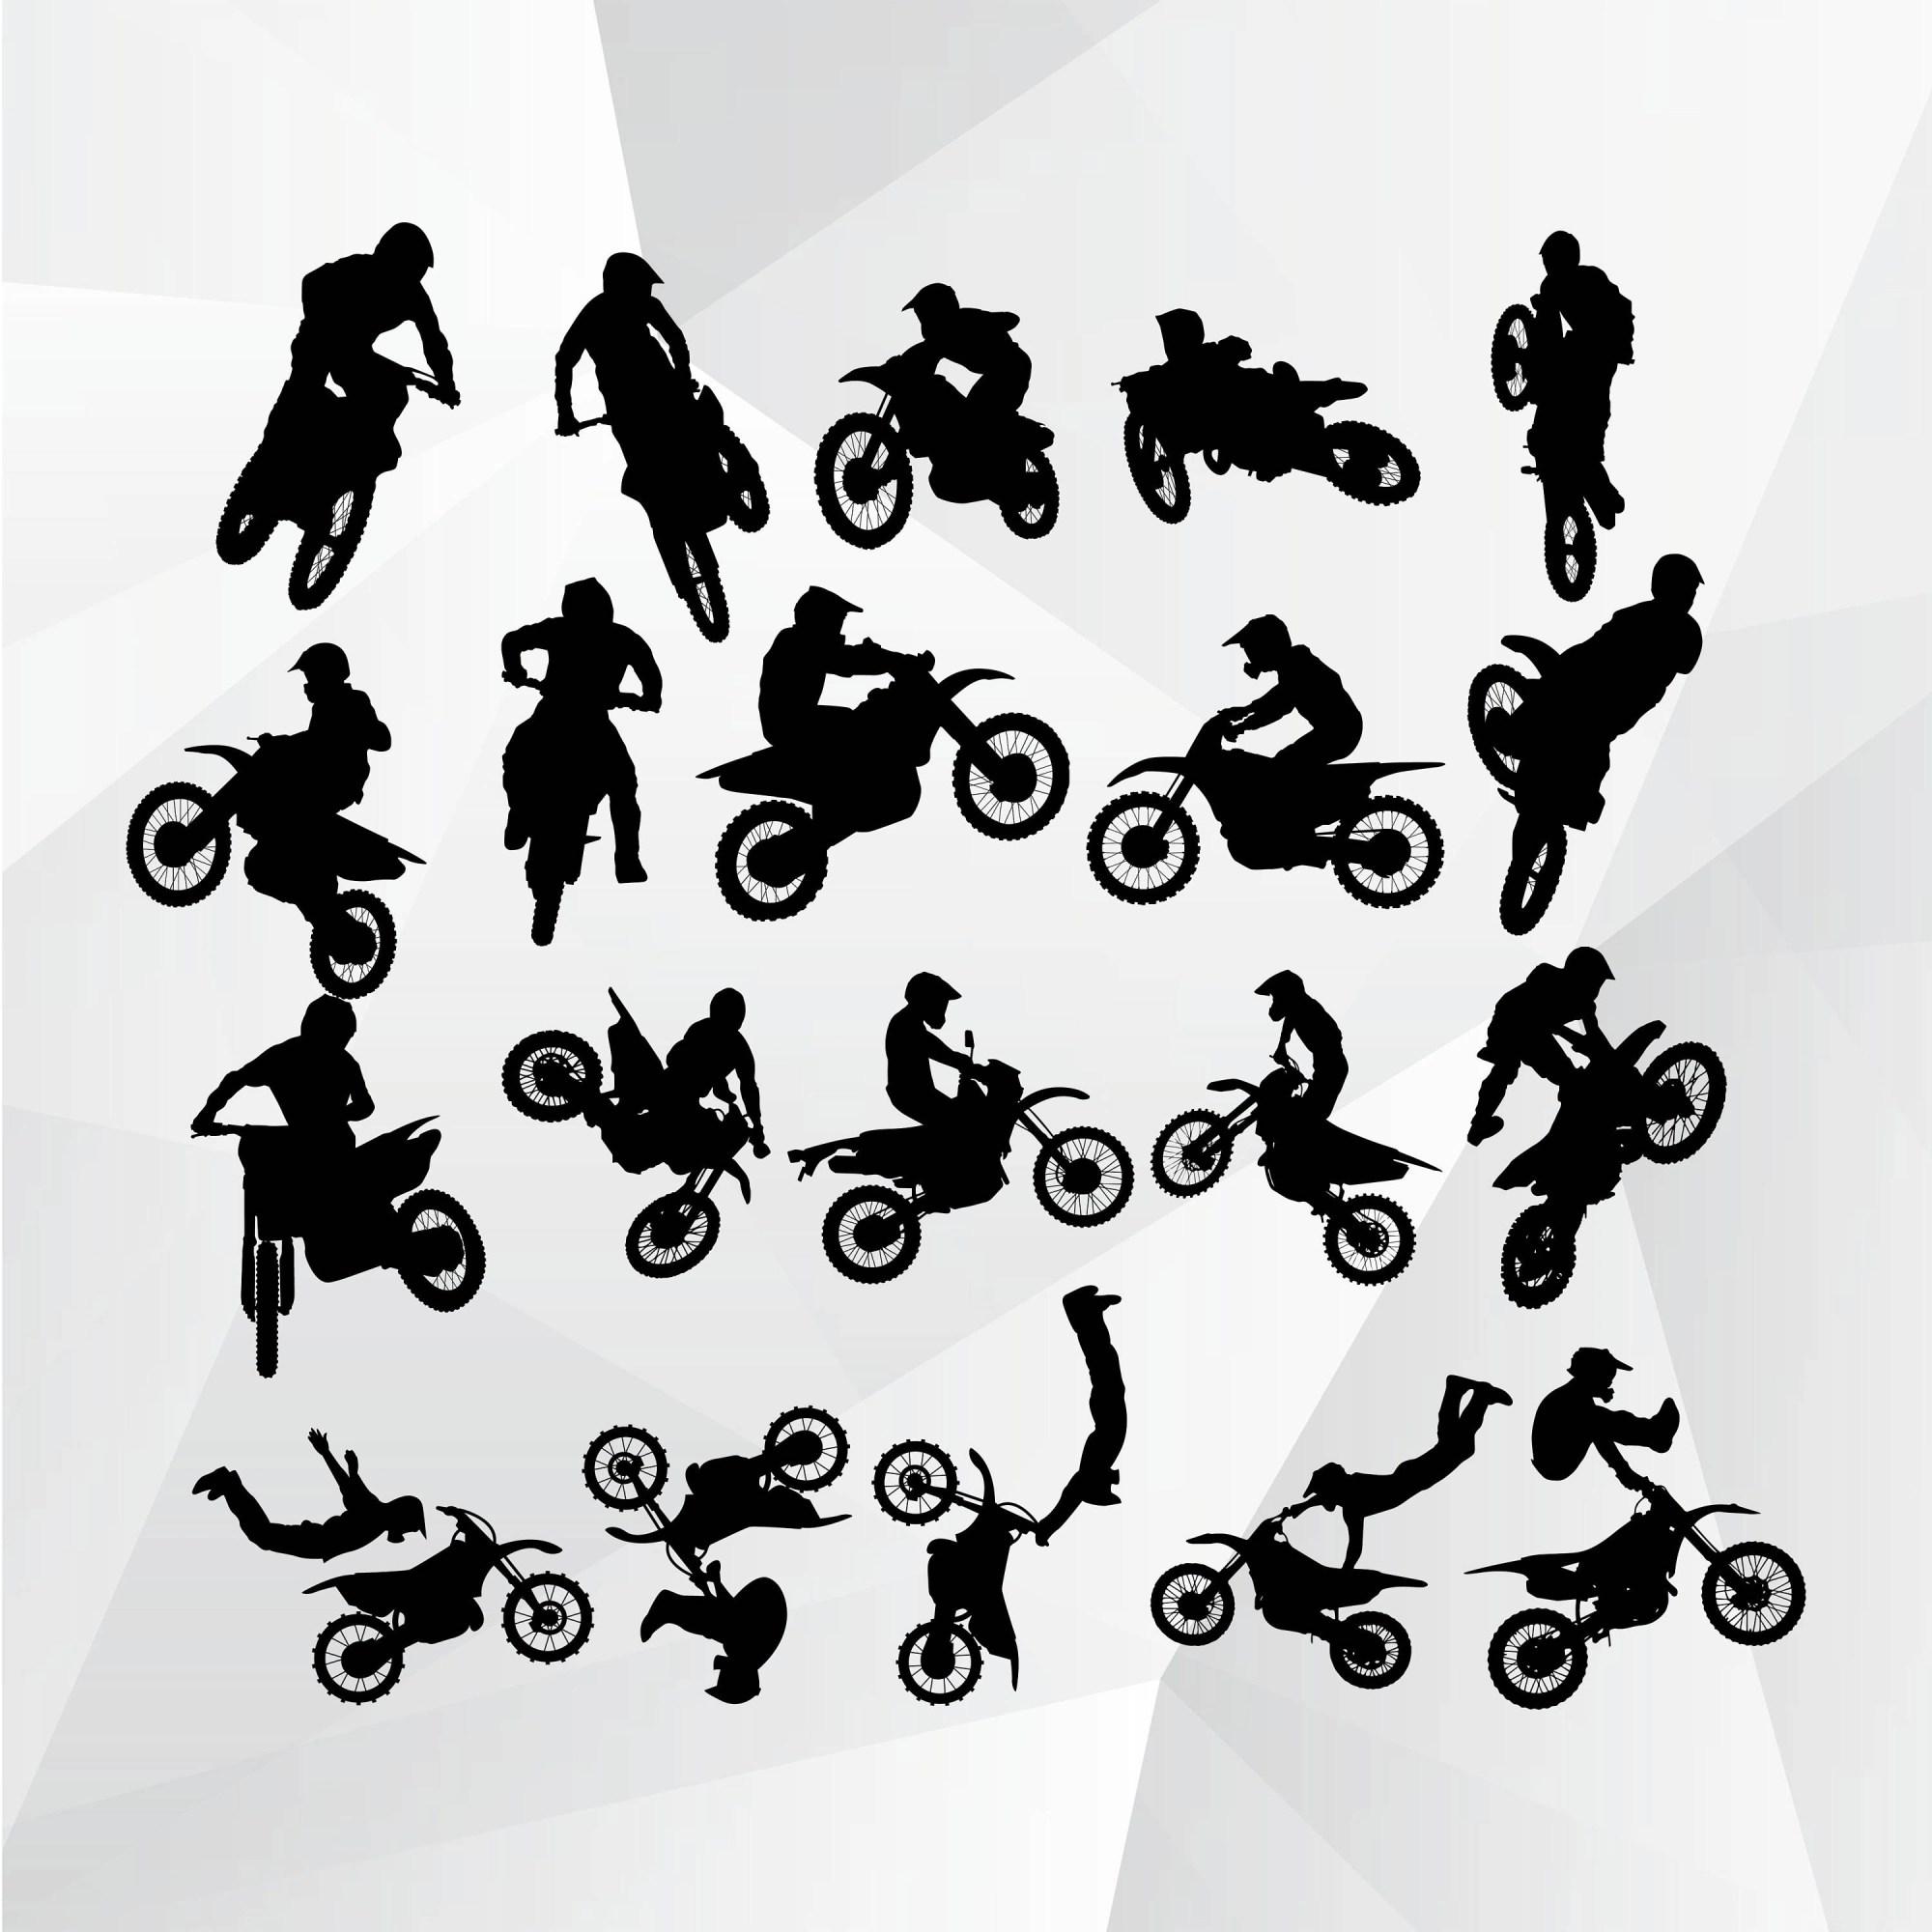 hight resolution of 50 dirt bike svgpngjpg dirt bike clipart